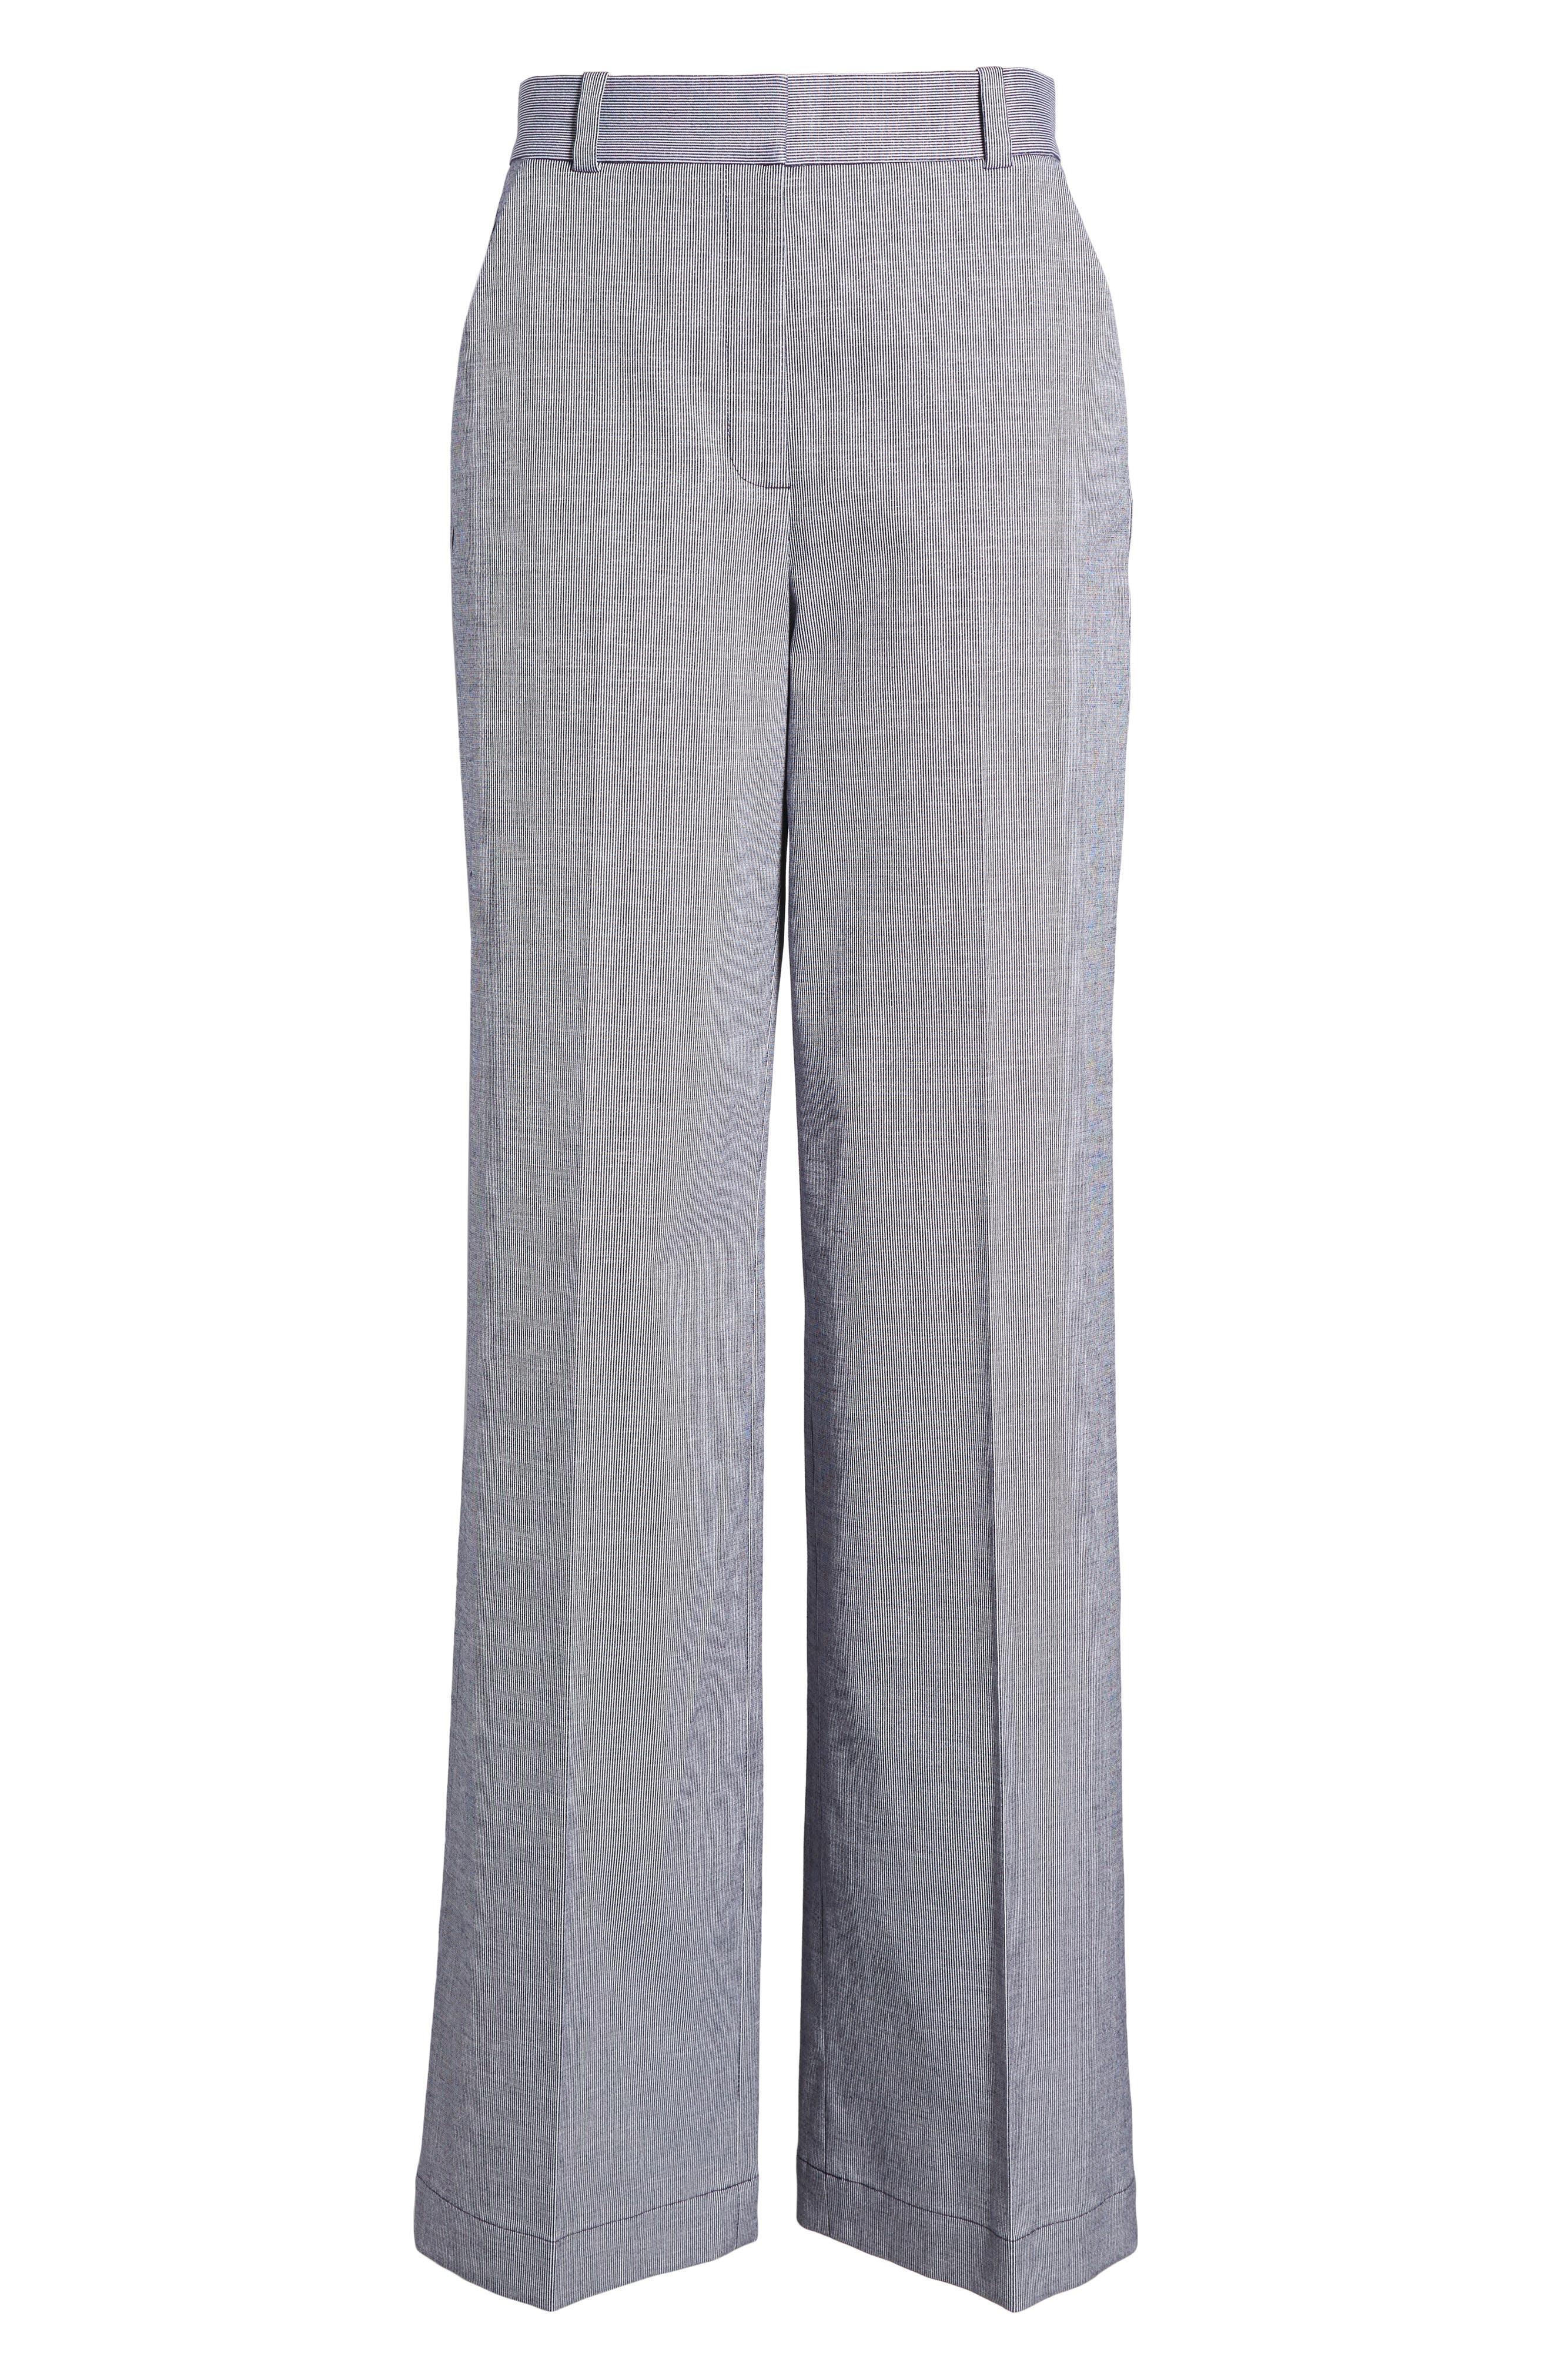 Ticking Stripe Pants,                             Alternate thumbnail 6, color,                             401